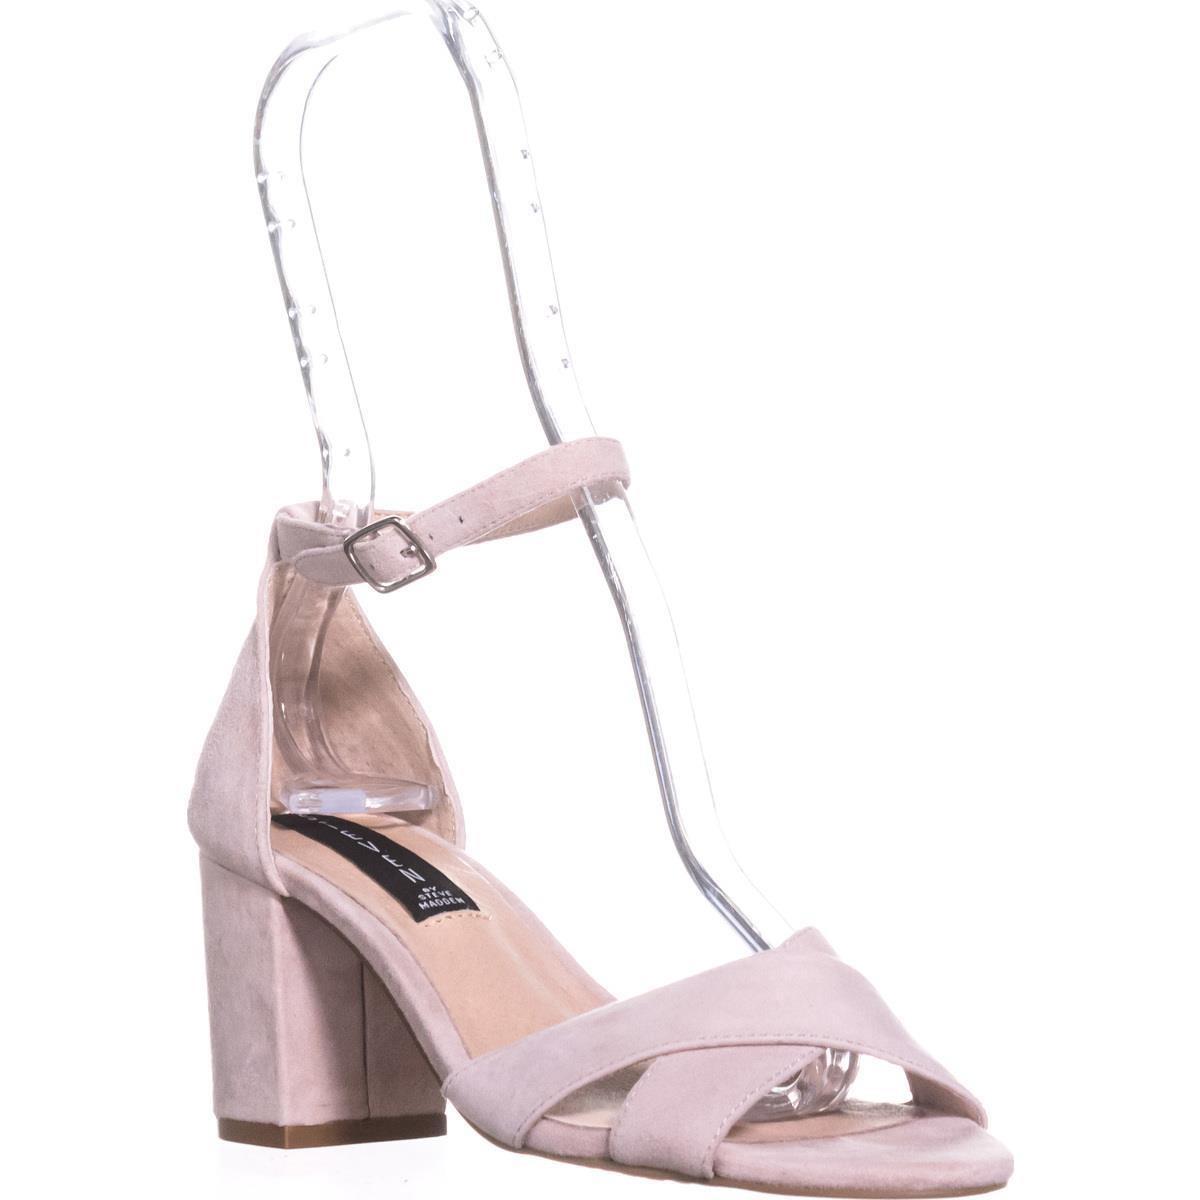 fdbfdbe0d62 Lyst - Steve Madden Steven Voomme Dress Sandals in Pink